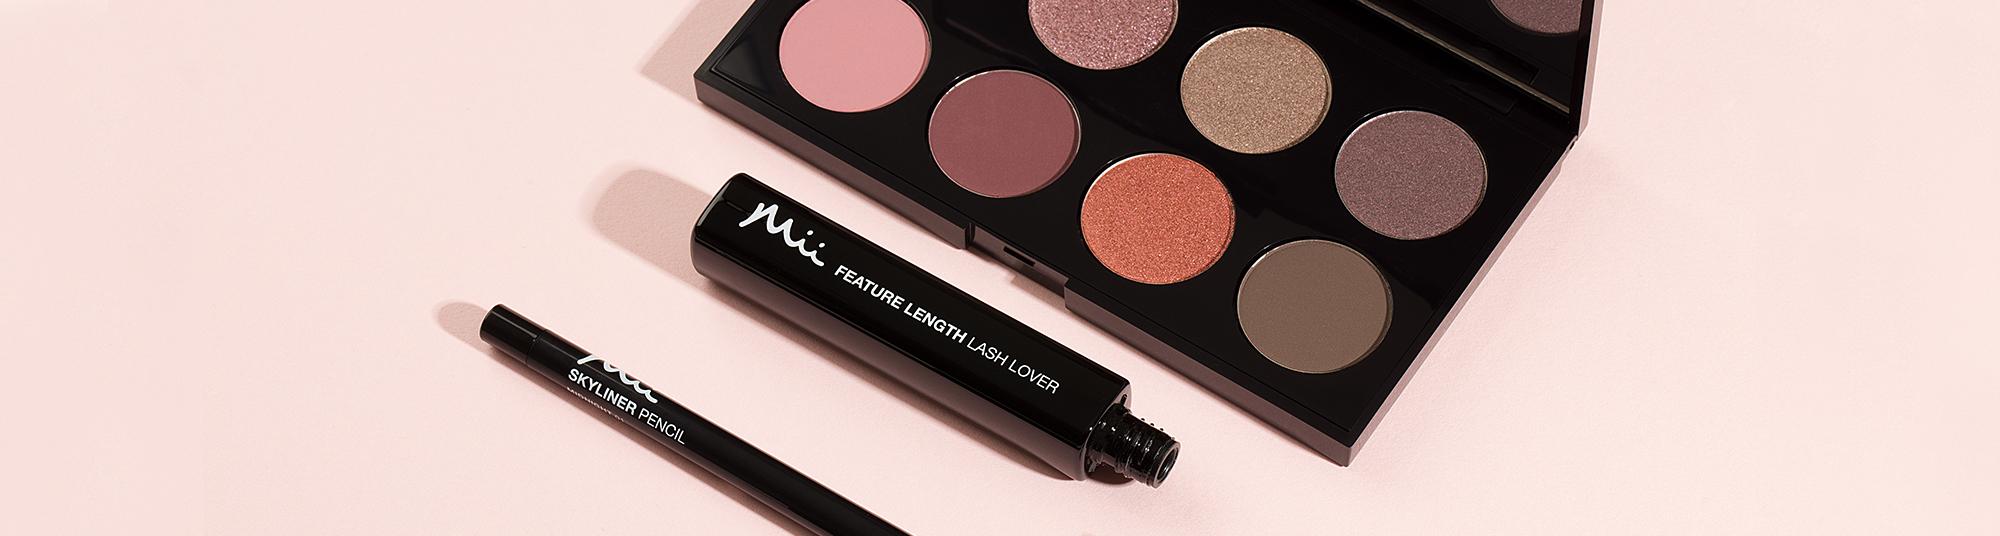 Mii Cosmetics Eye Makeup category